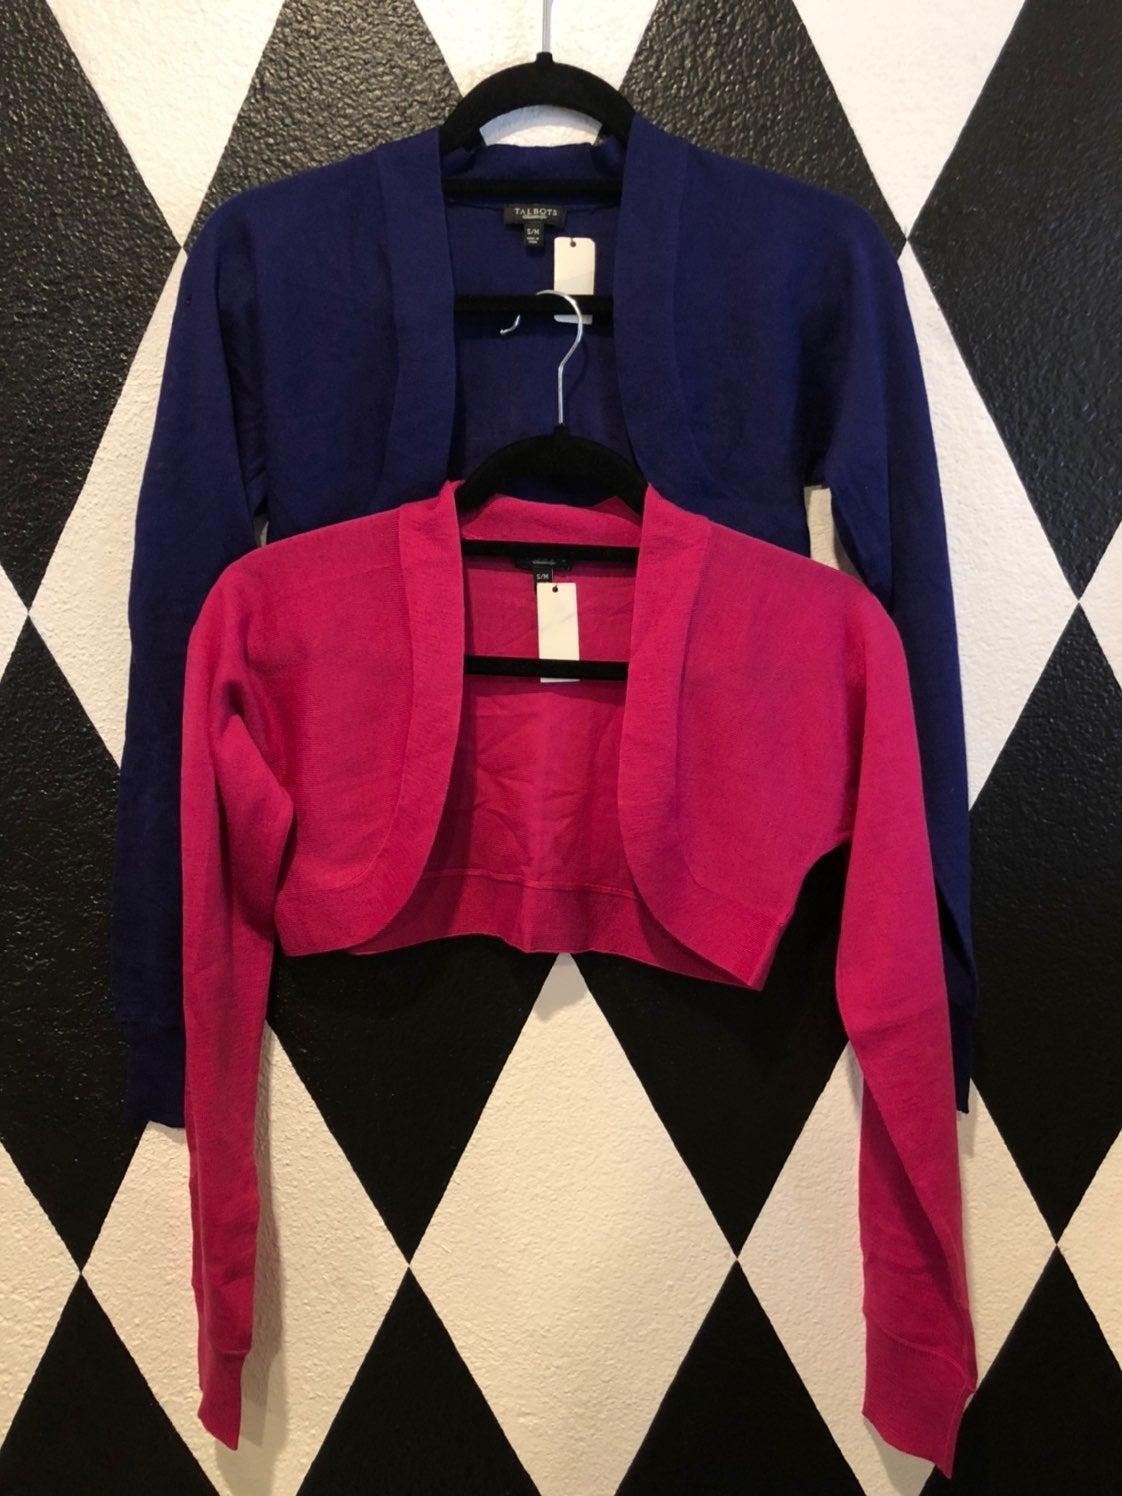 Hot Pink & Purple Bolero/ Shrug